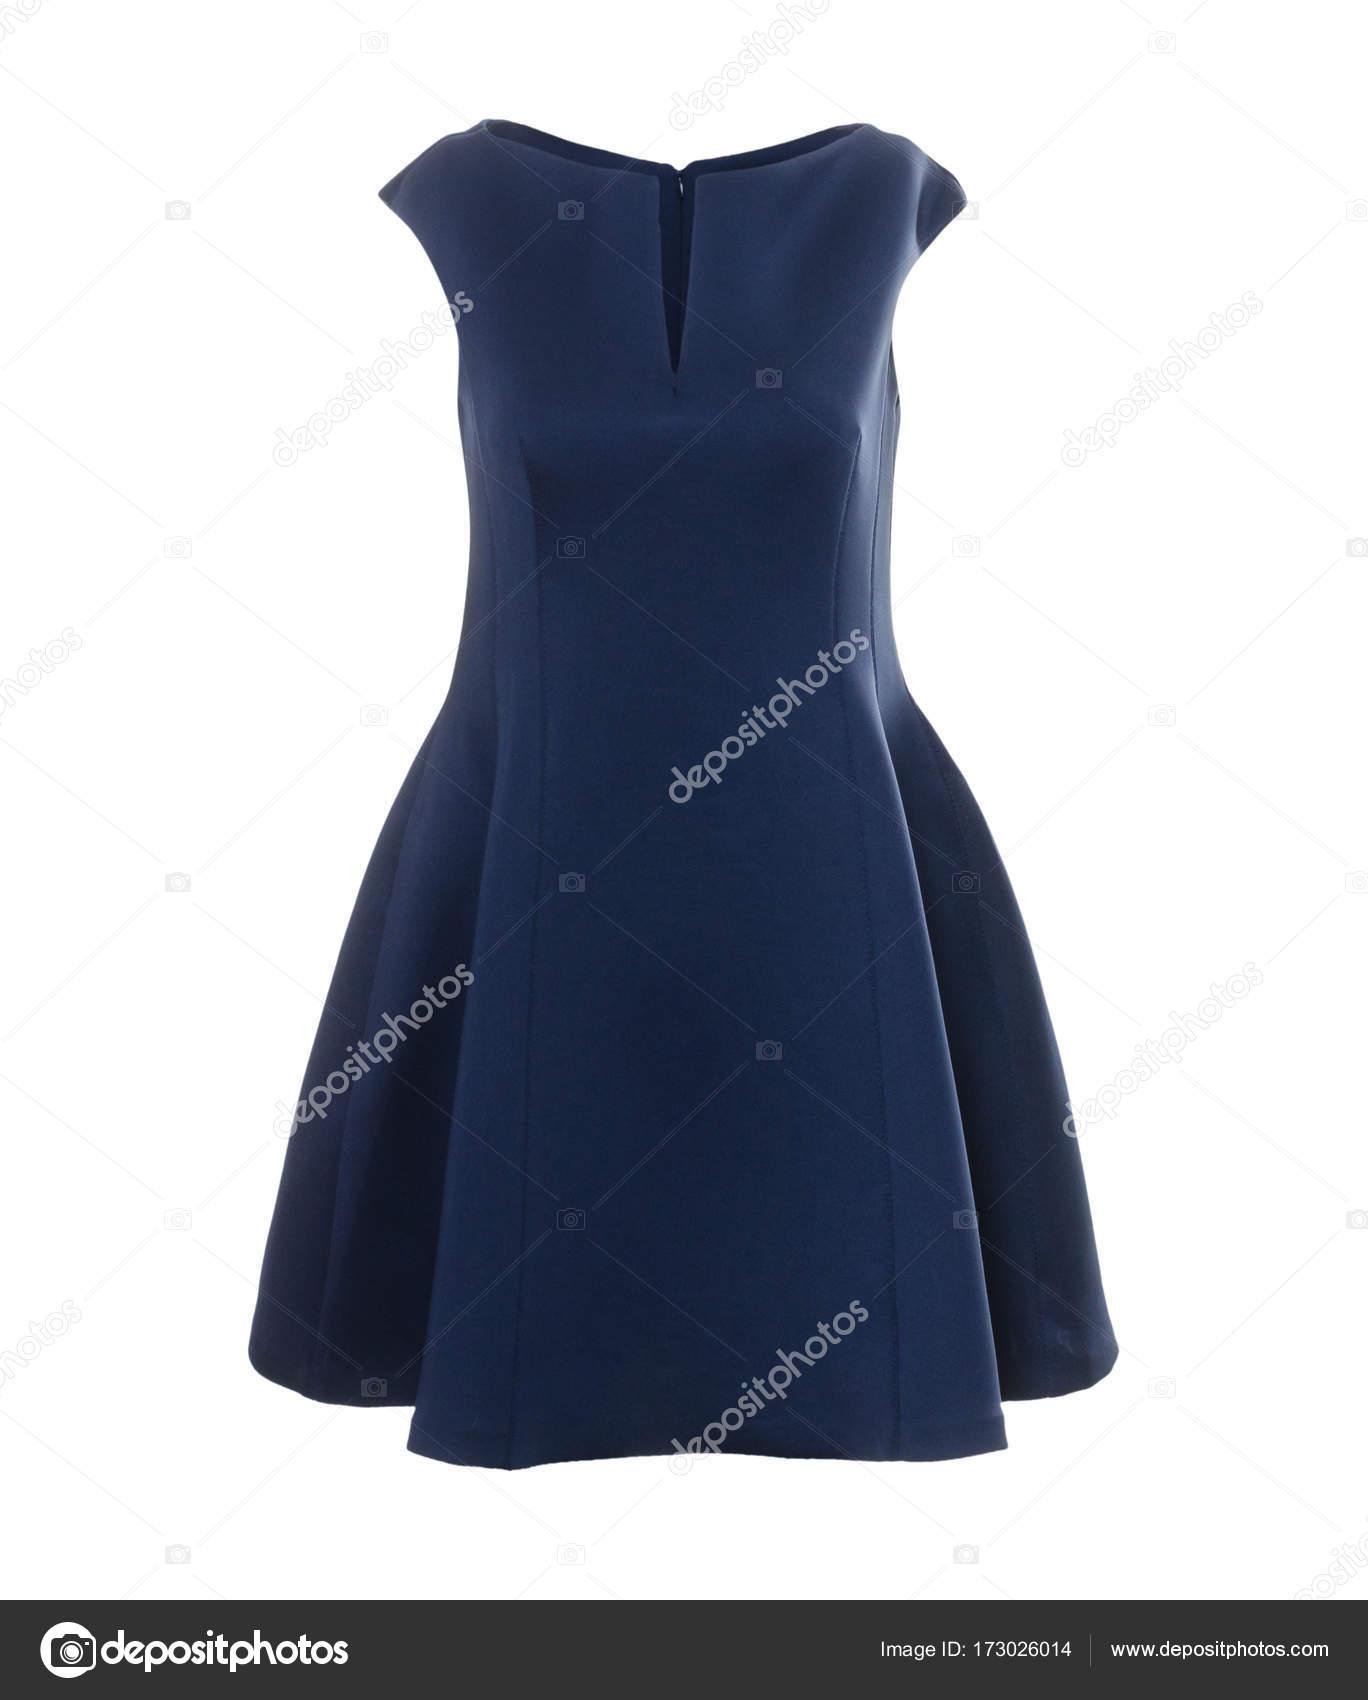 Elegante Hermoso Vestido Azul Oscuro Sobre Fondo Blanco